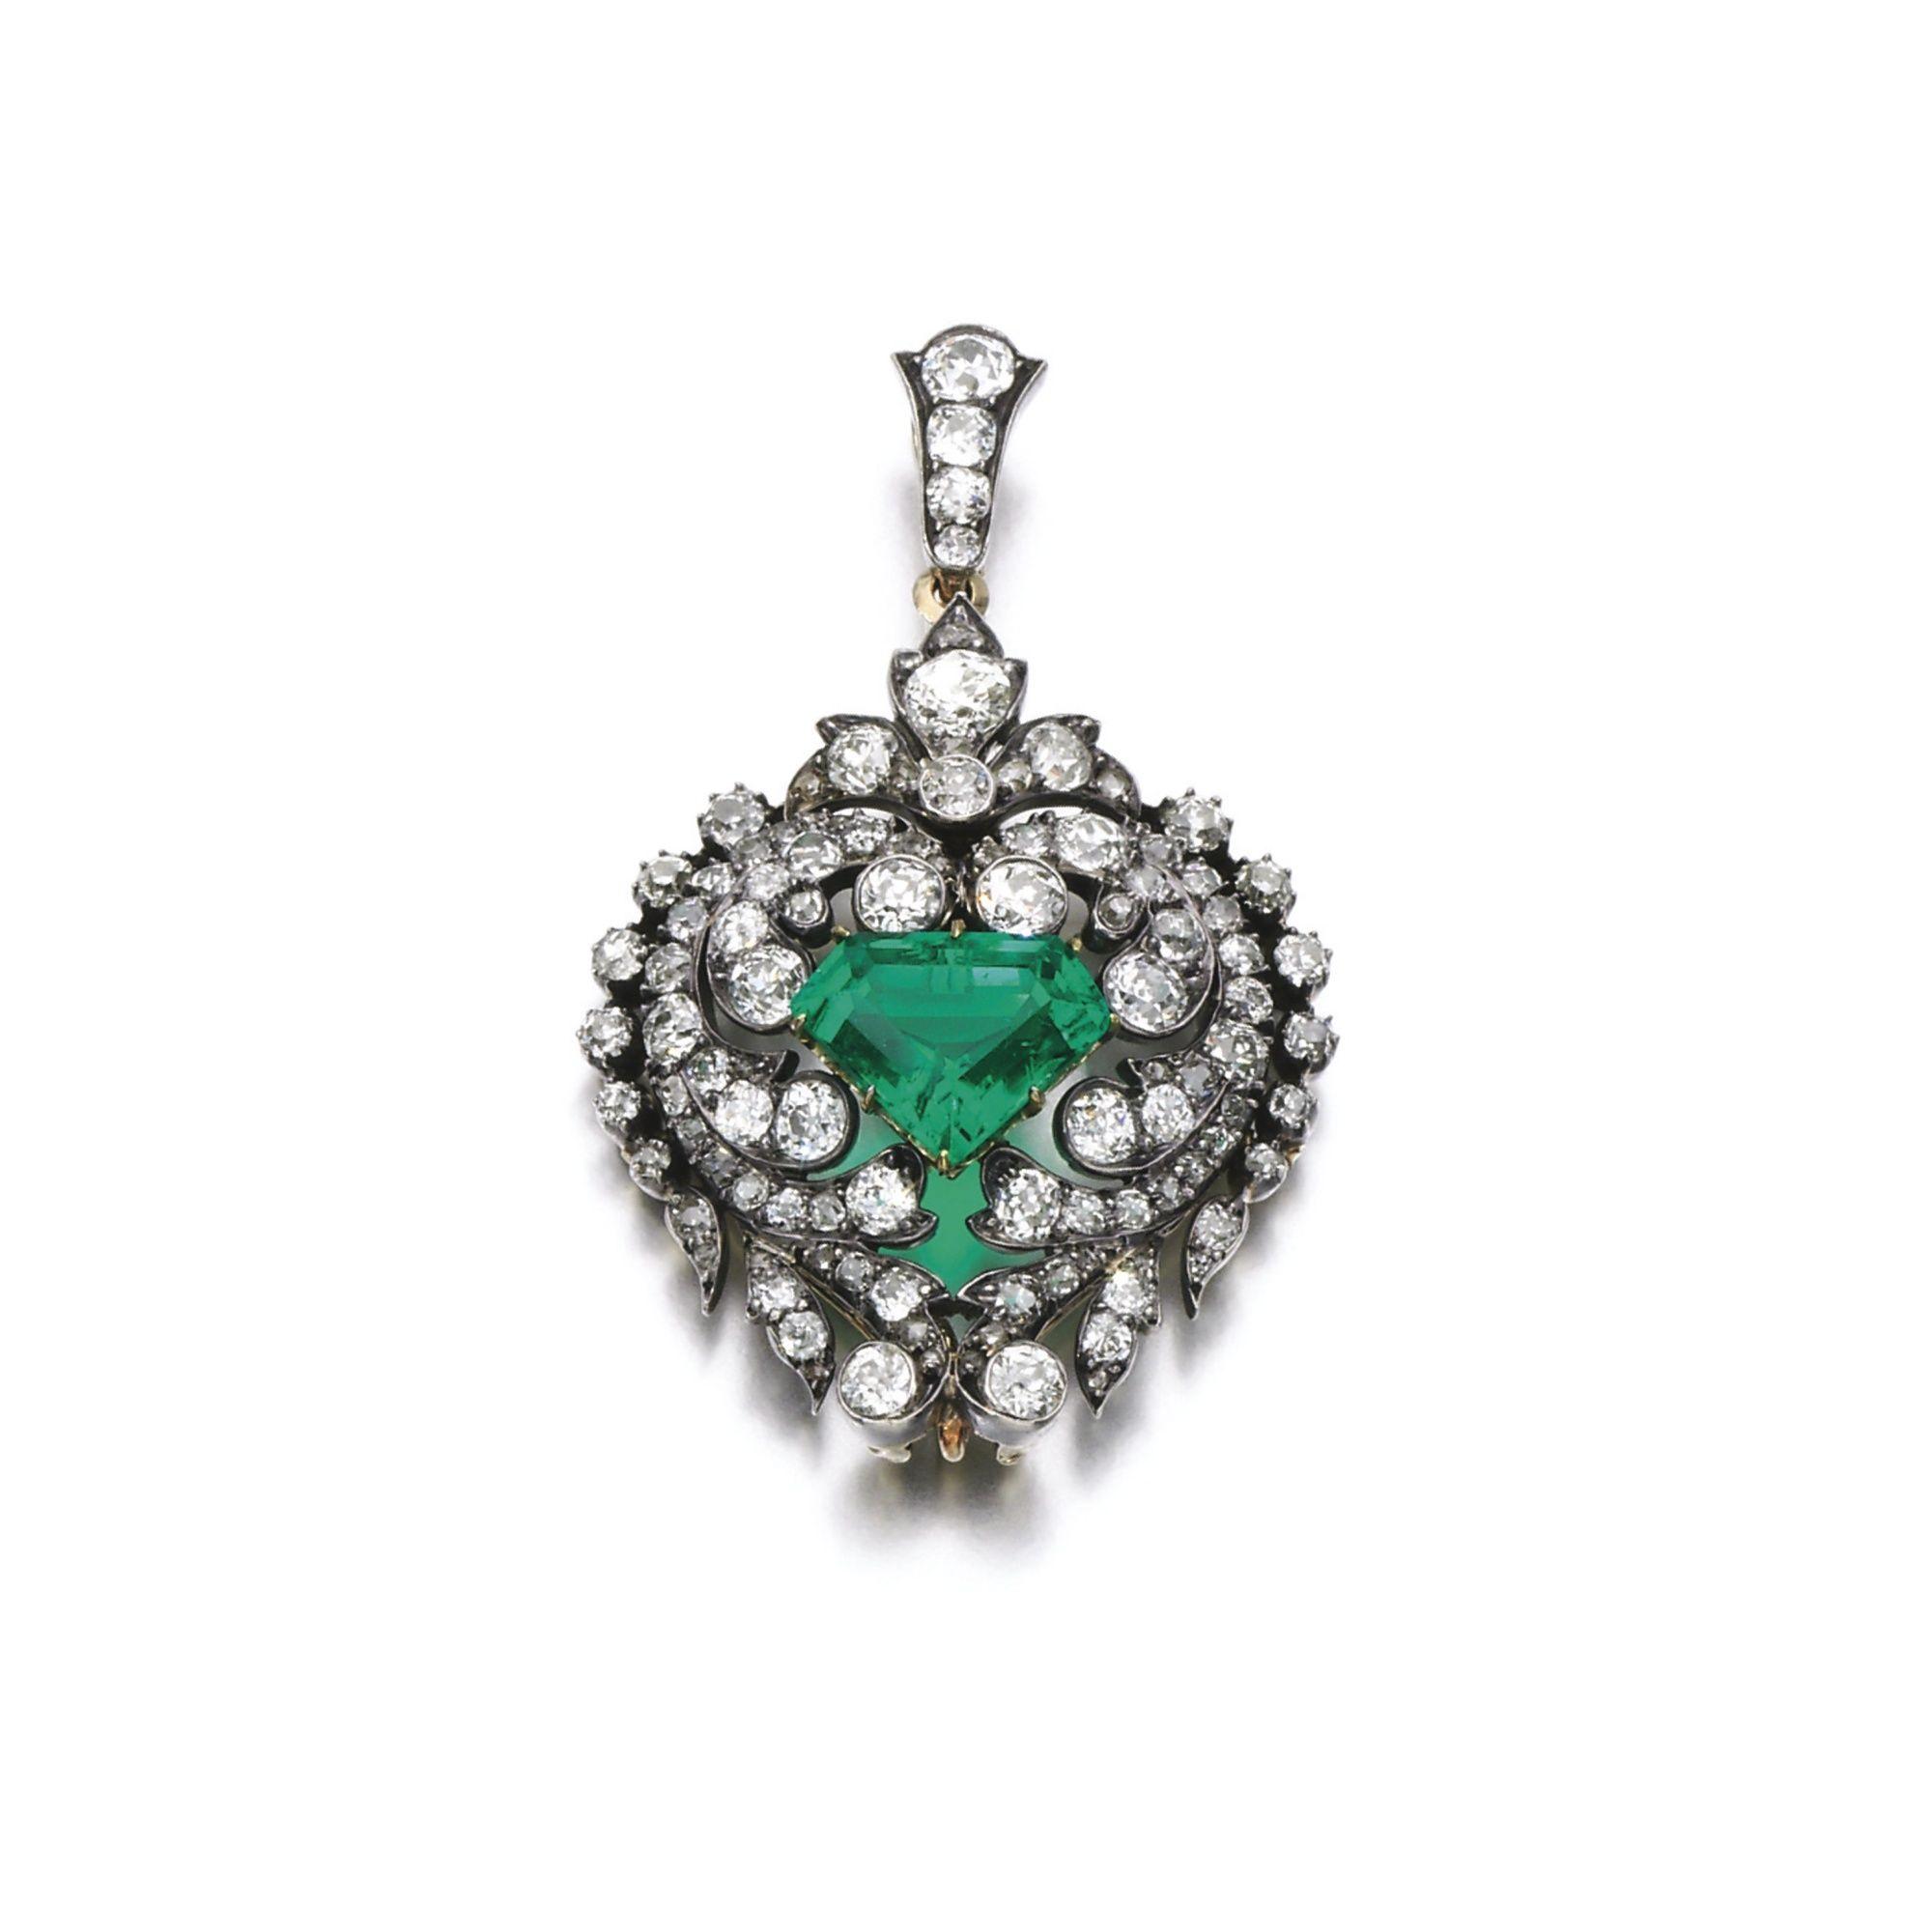 Emerald and diamond brooch pendant late th century lot